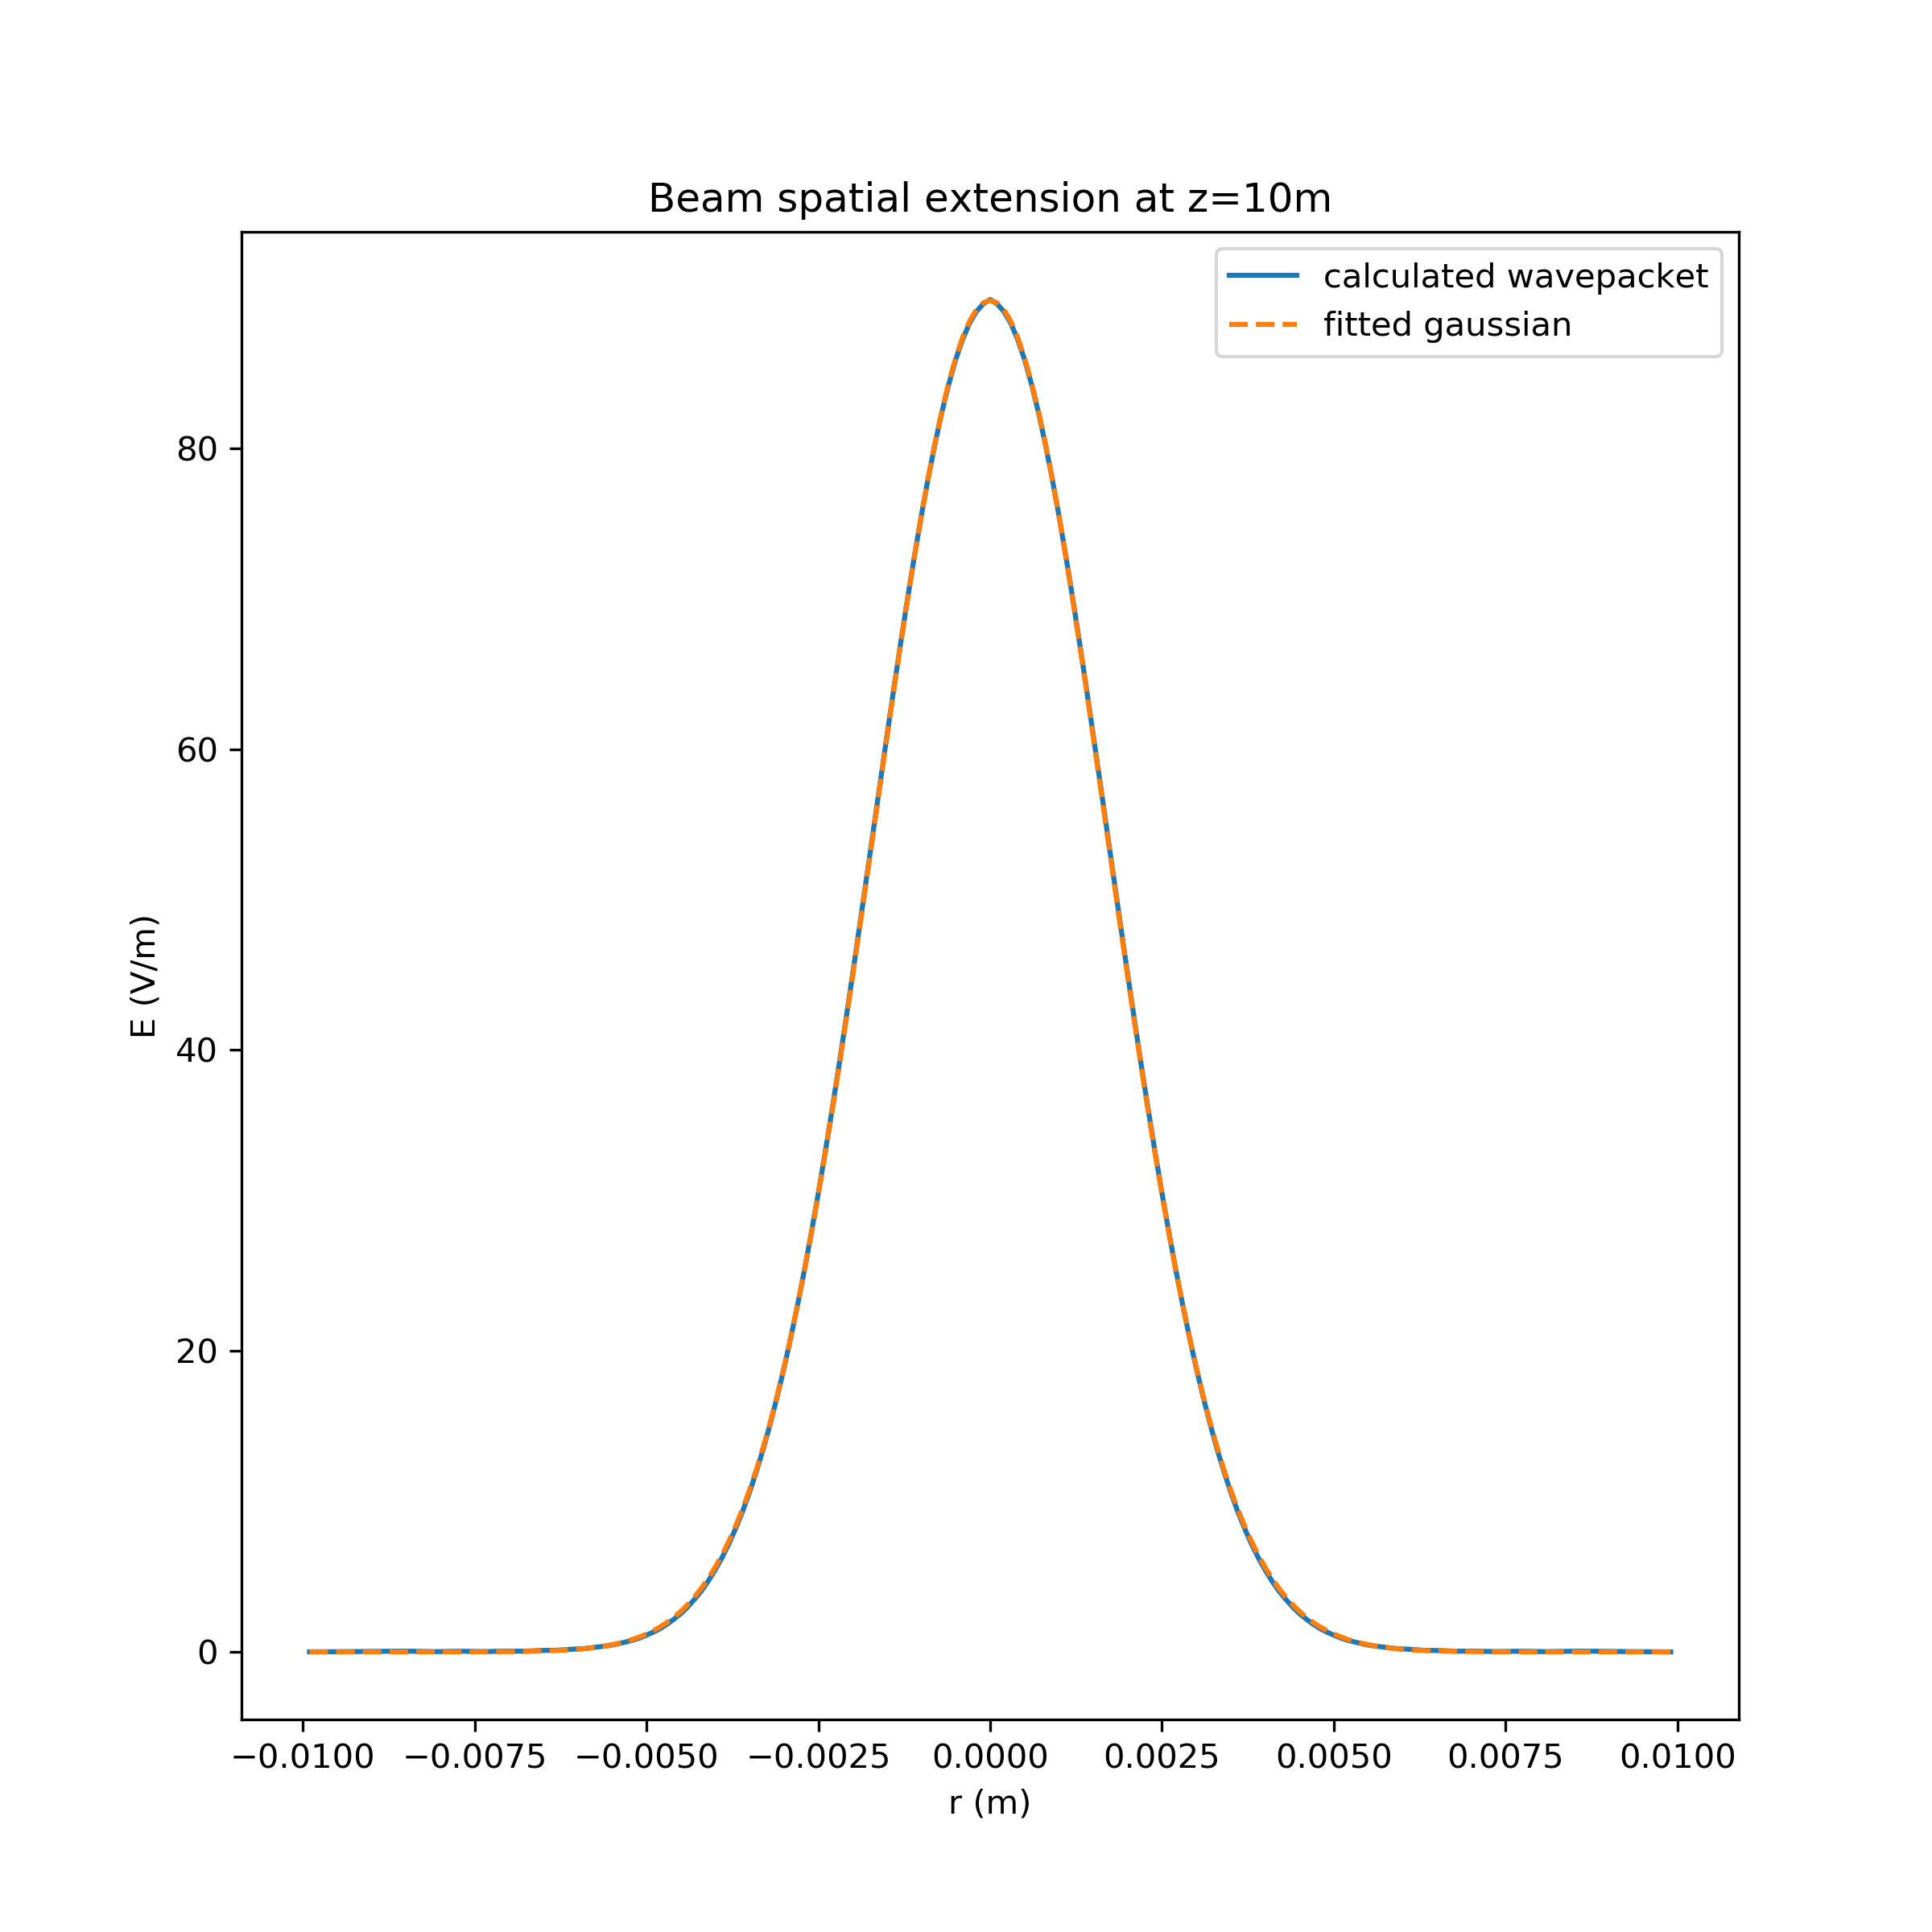 figures/HSCN/spatial_fit_end.png